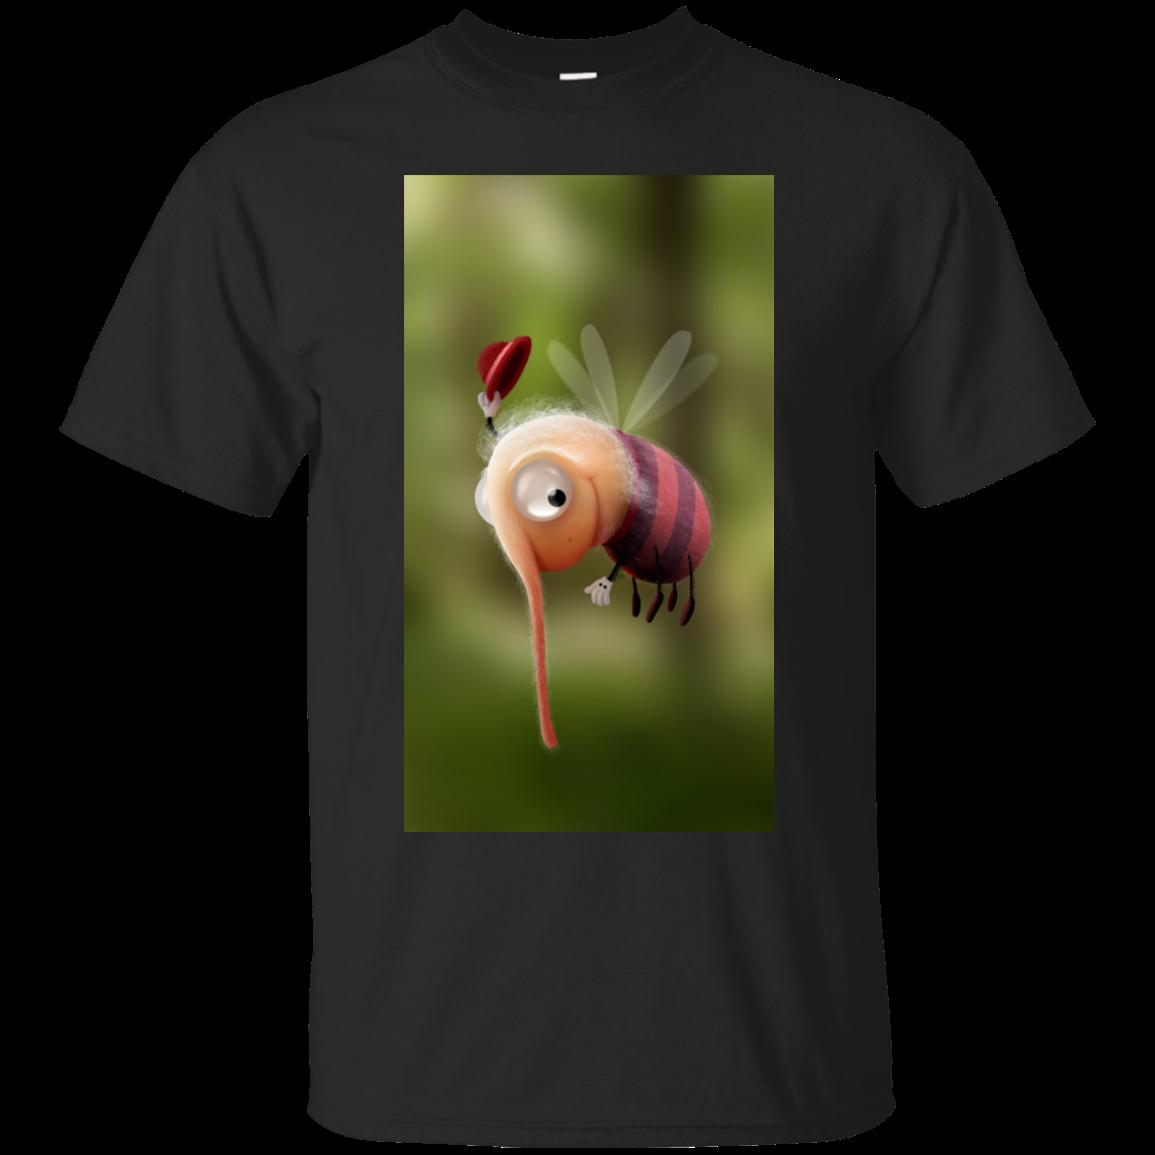 Bug T Shirt